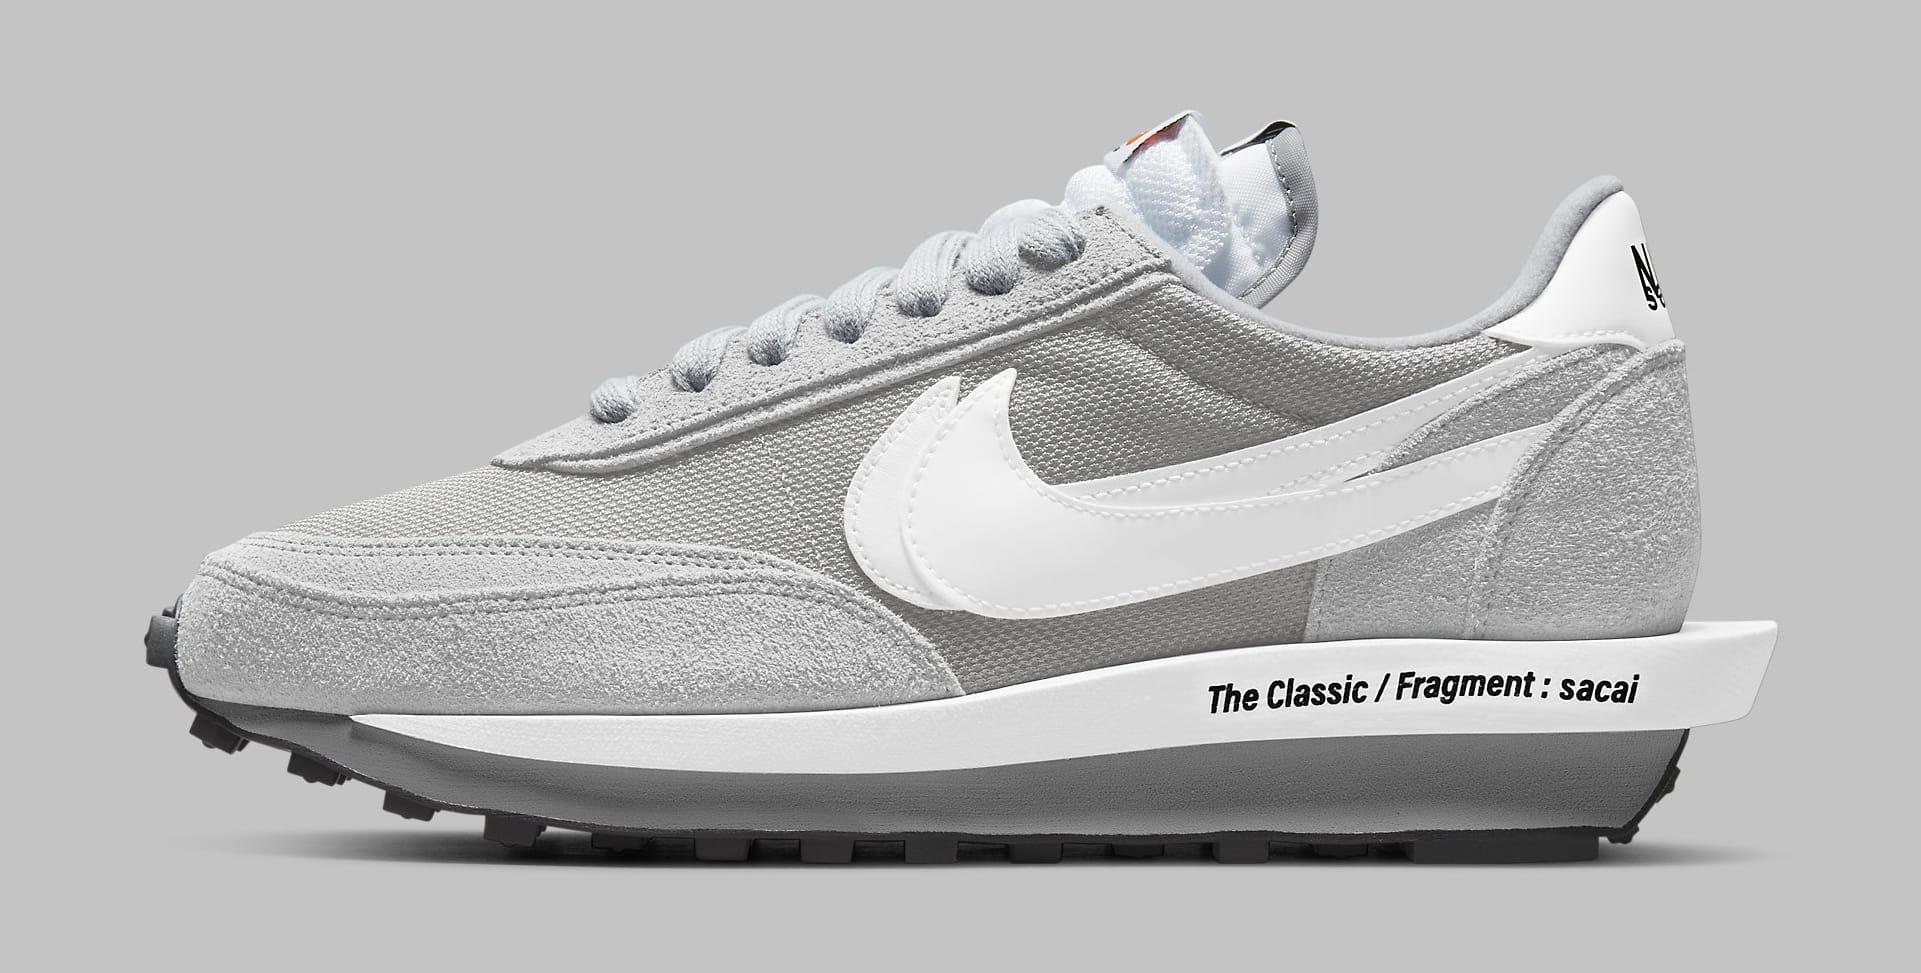 Fragment x Sacai x Nike LDWaffle 'Light Smoke Grey' DH2684-001 Lateral